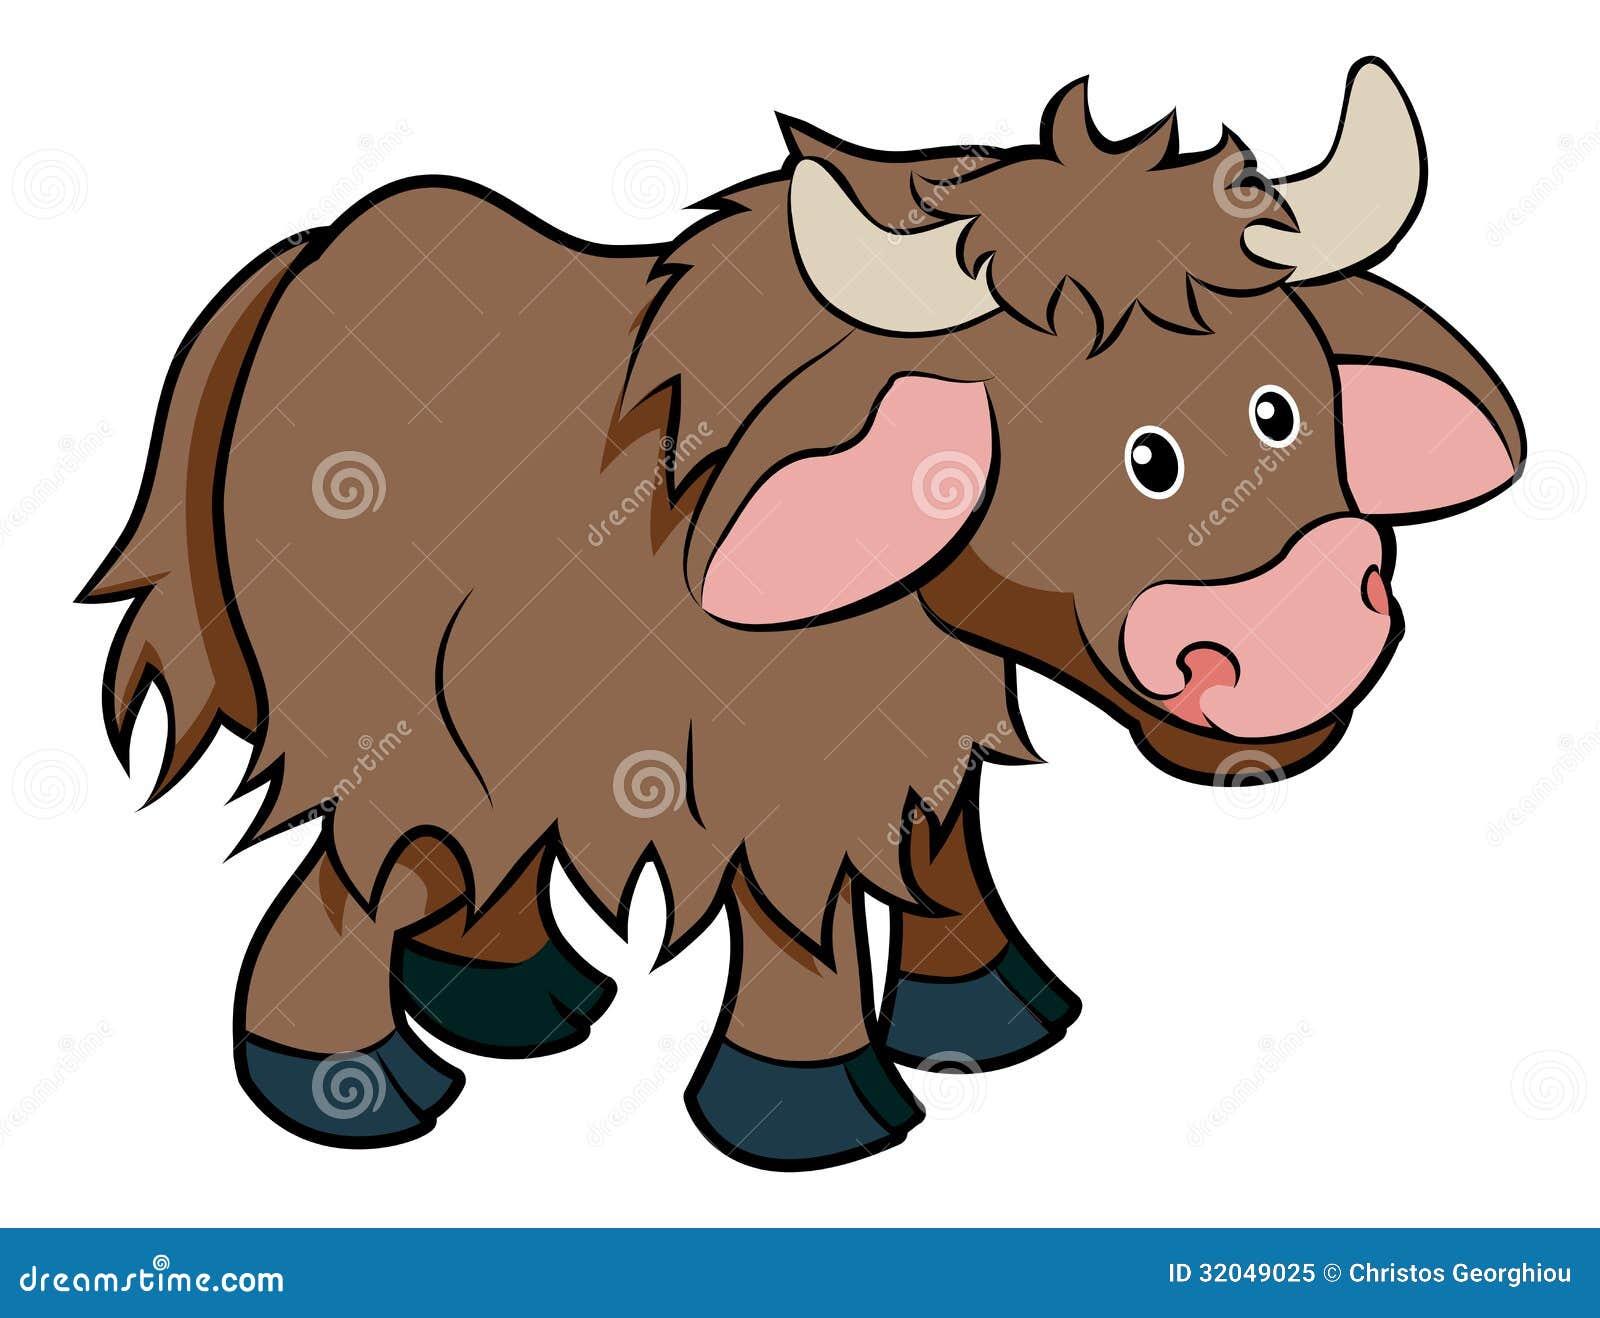 An illustration of a cute happy cartoon hairy Yak animal character.